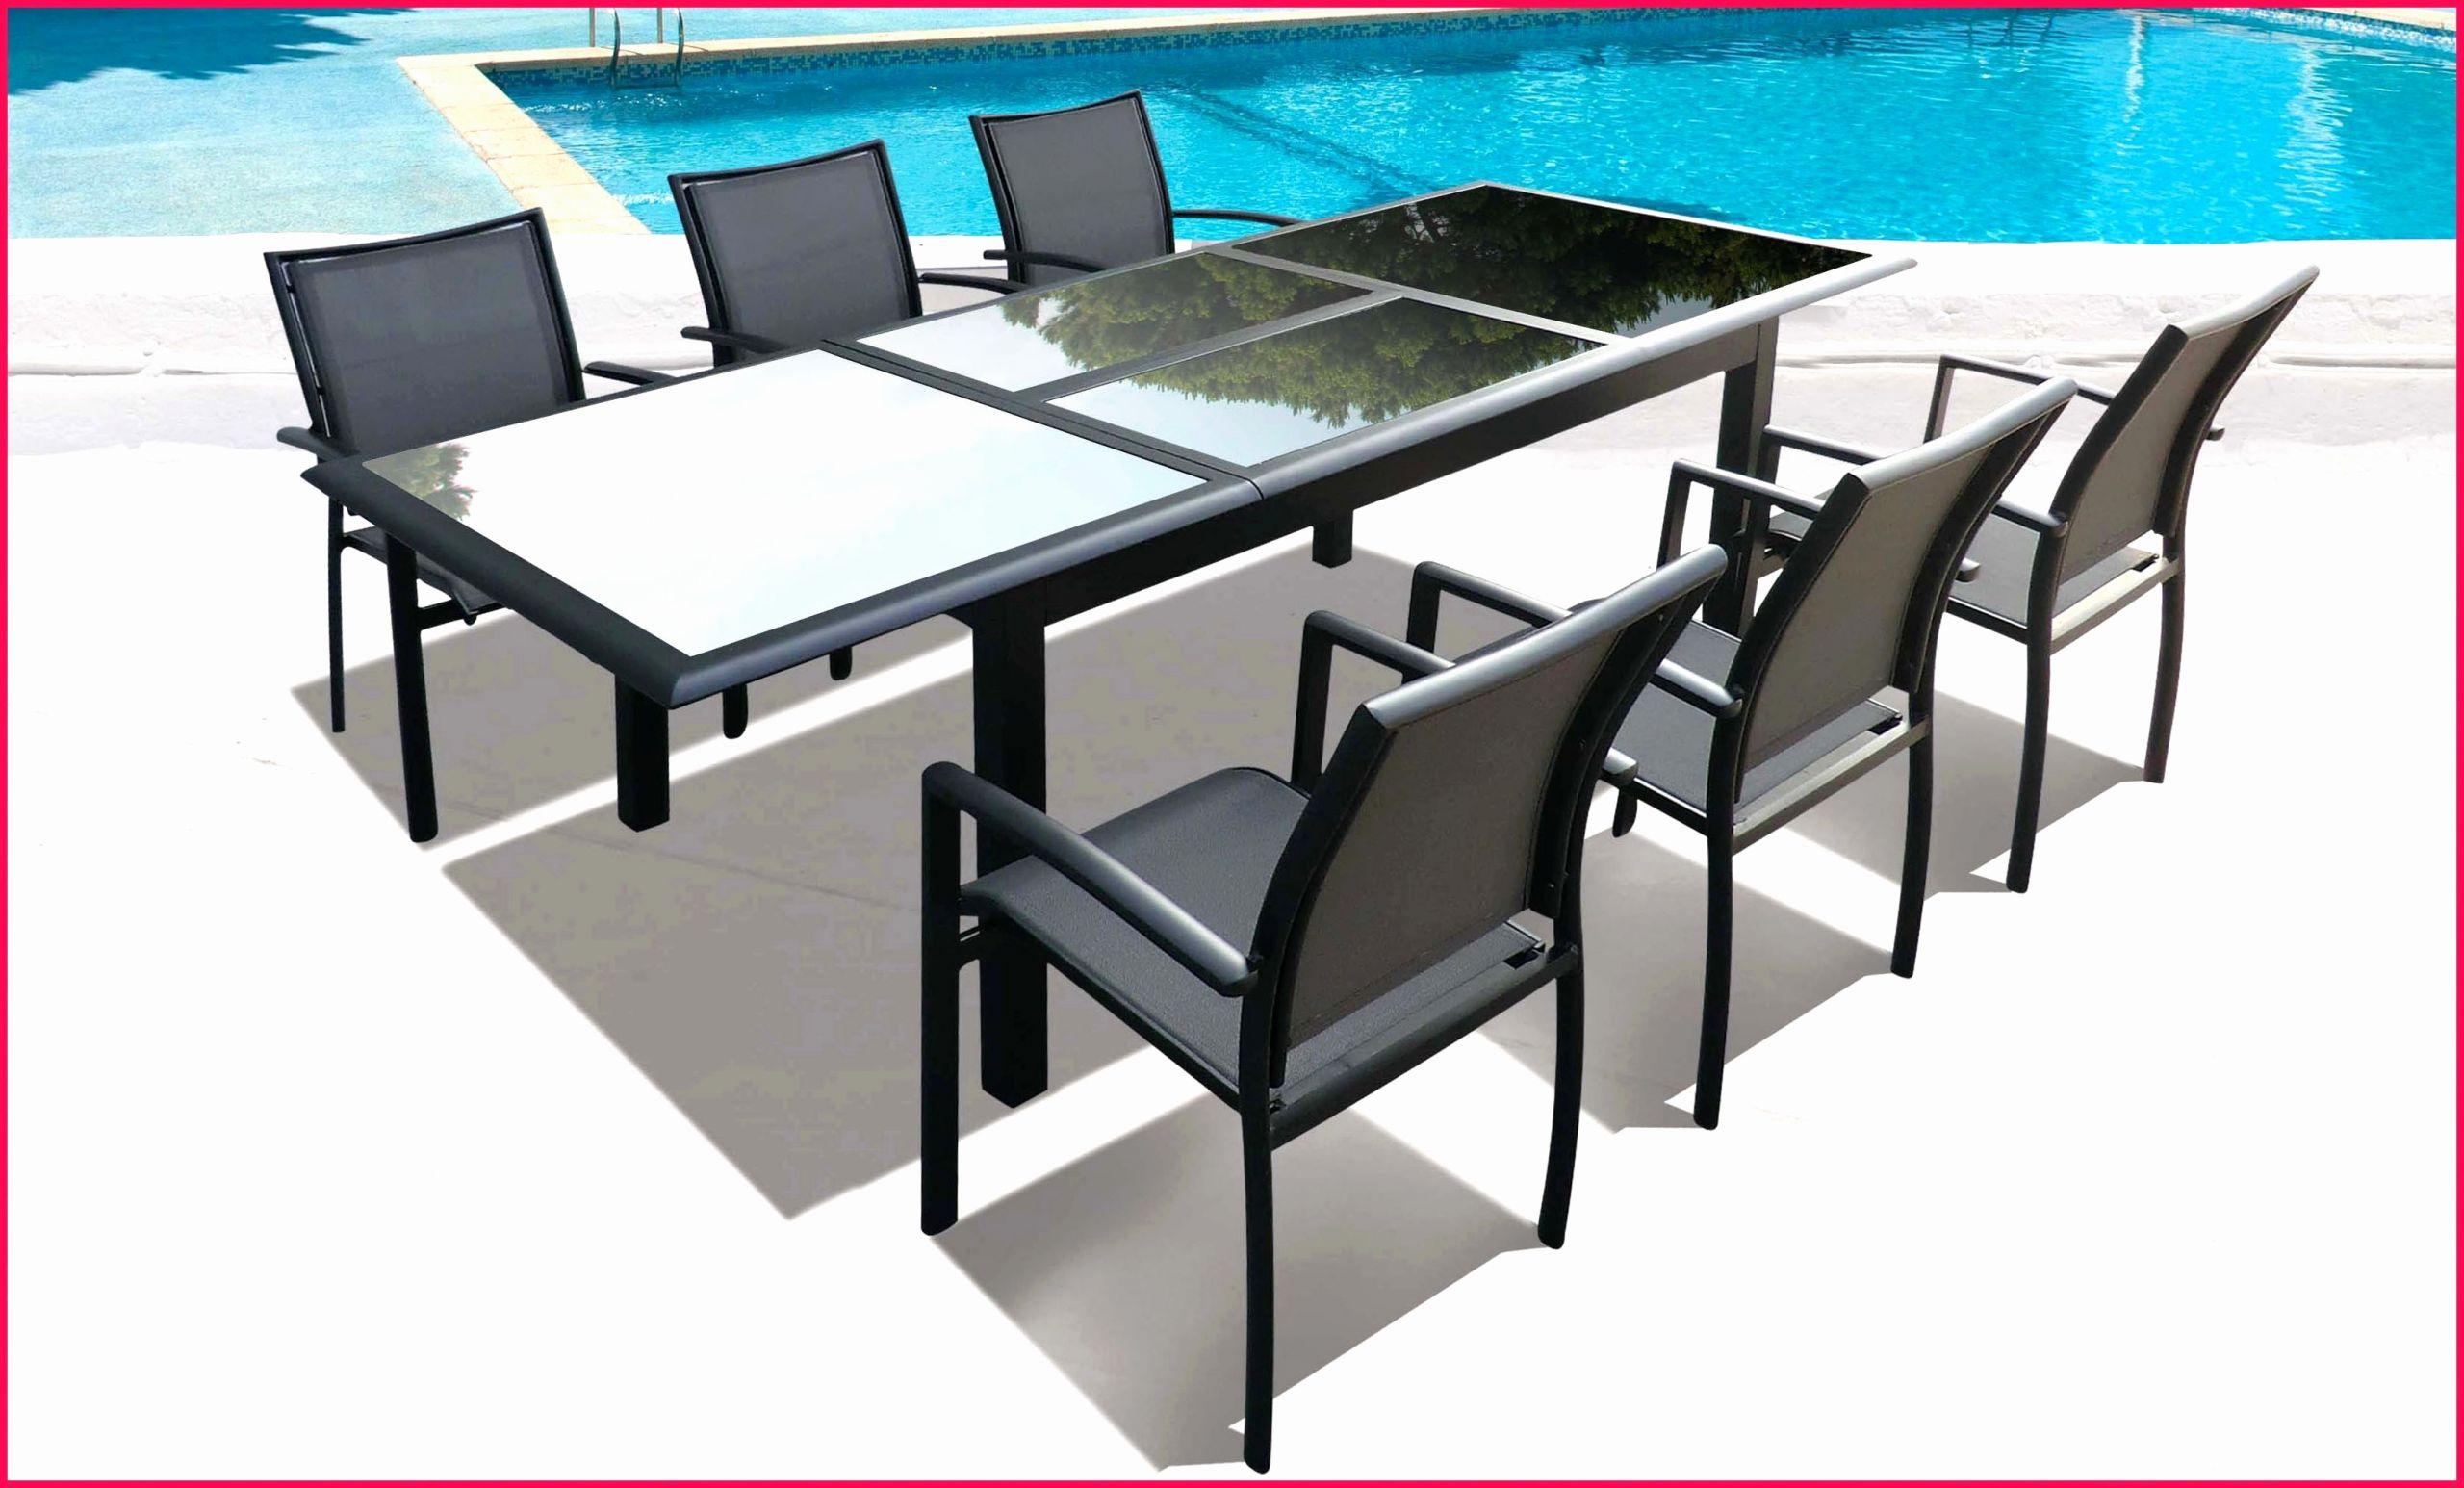 canape pour veranda luxe canisse brico depot bache transparente pour veranda profil alu pour of canape pour veranda